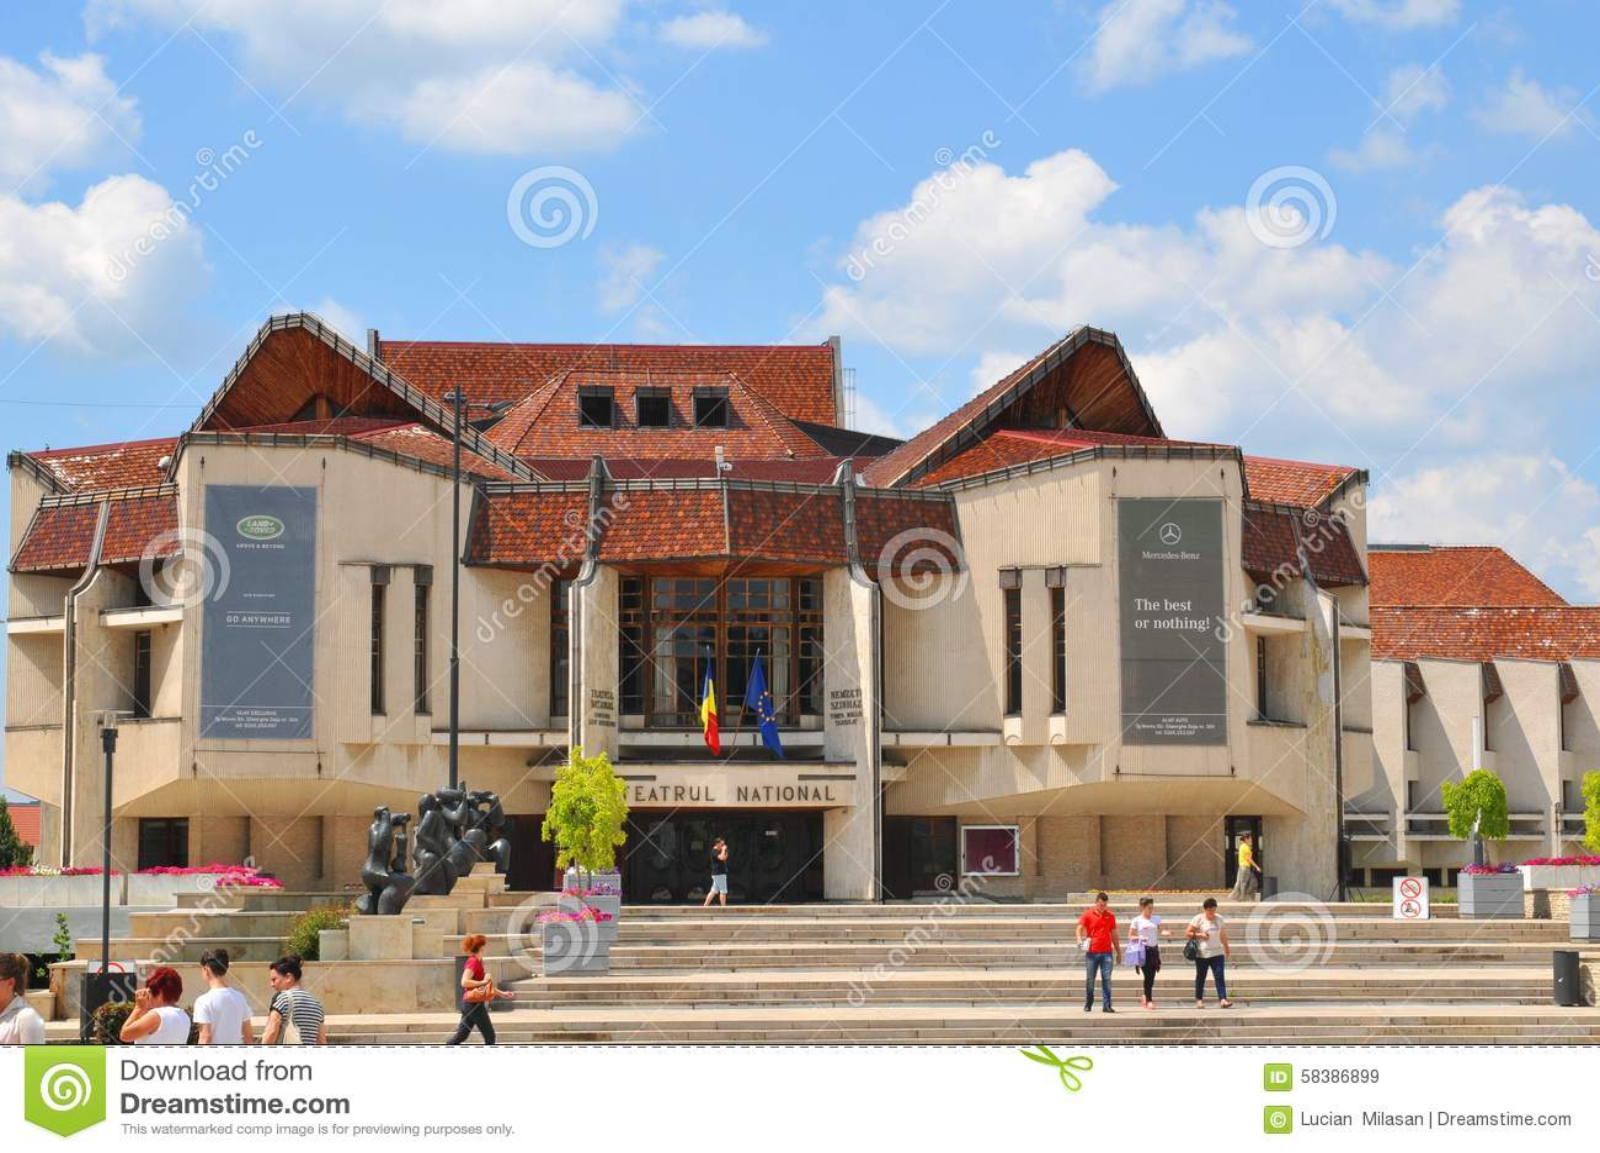 Targu Mures Romania  city photo : Targu Mures, Romania July 2, 2015: View of modern architecture of ...